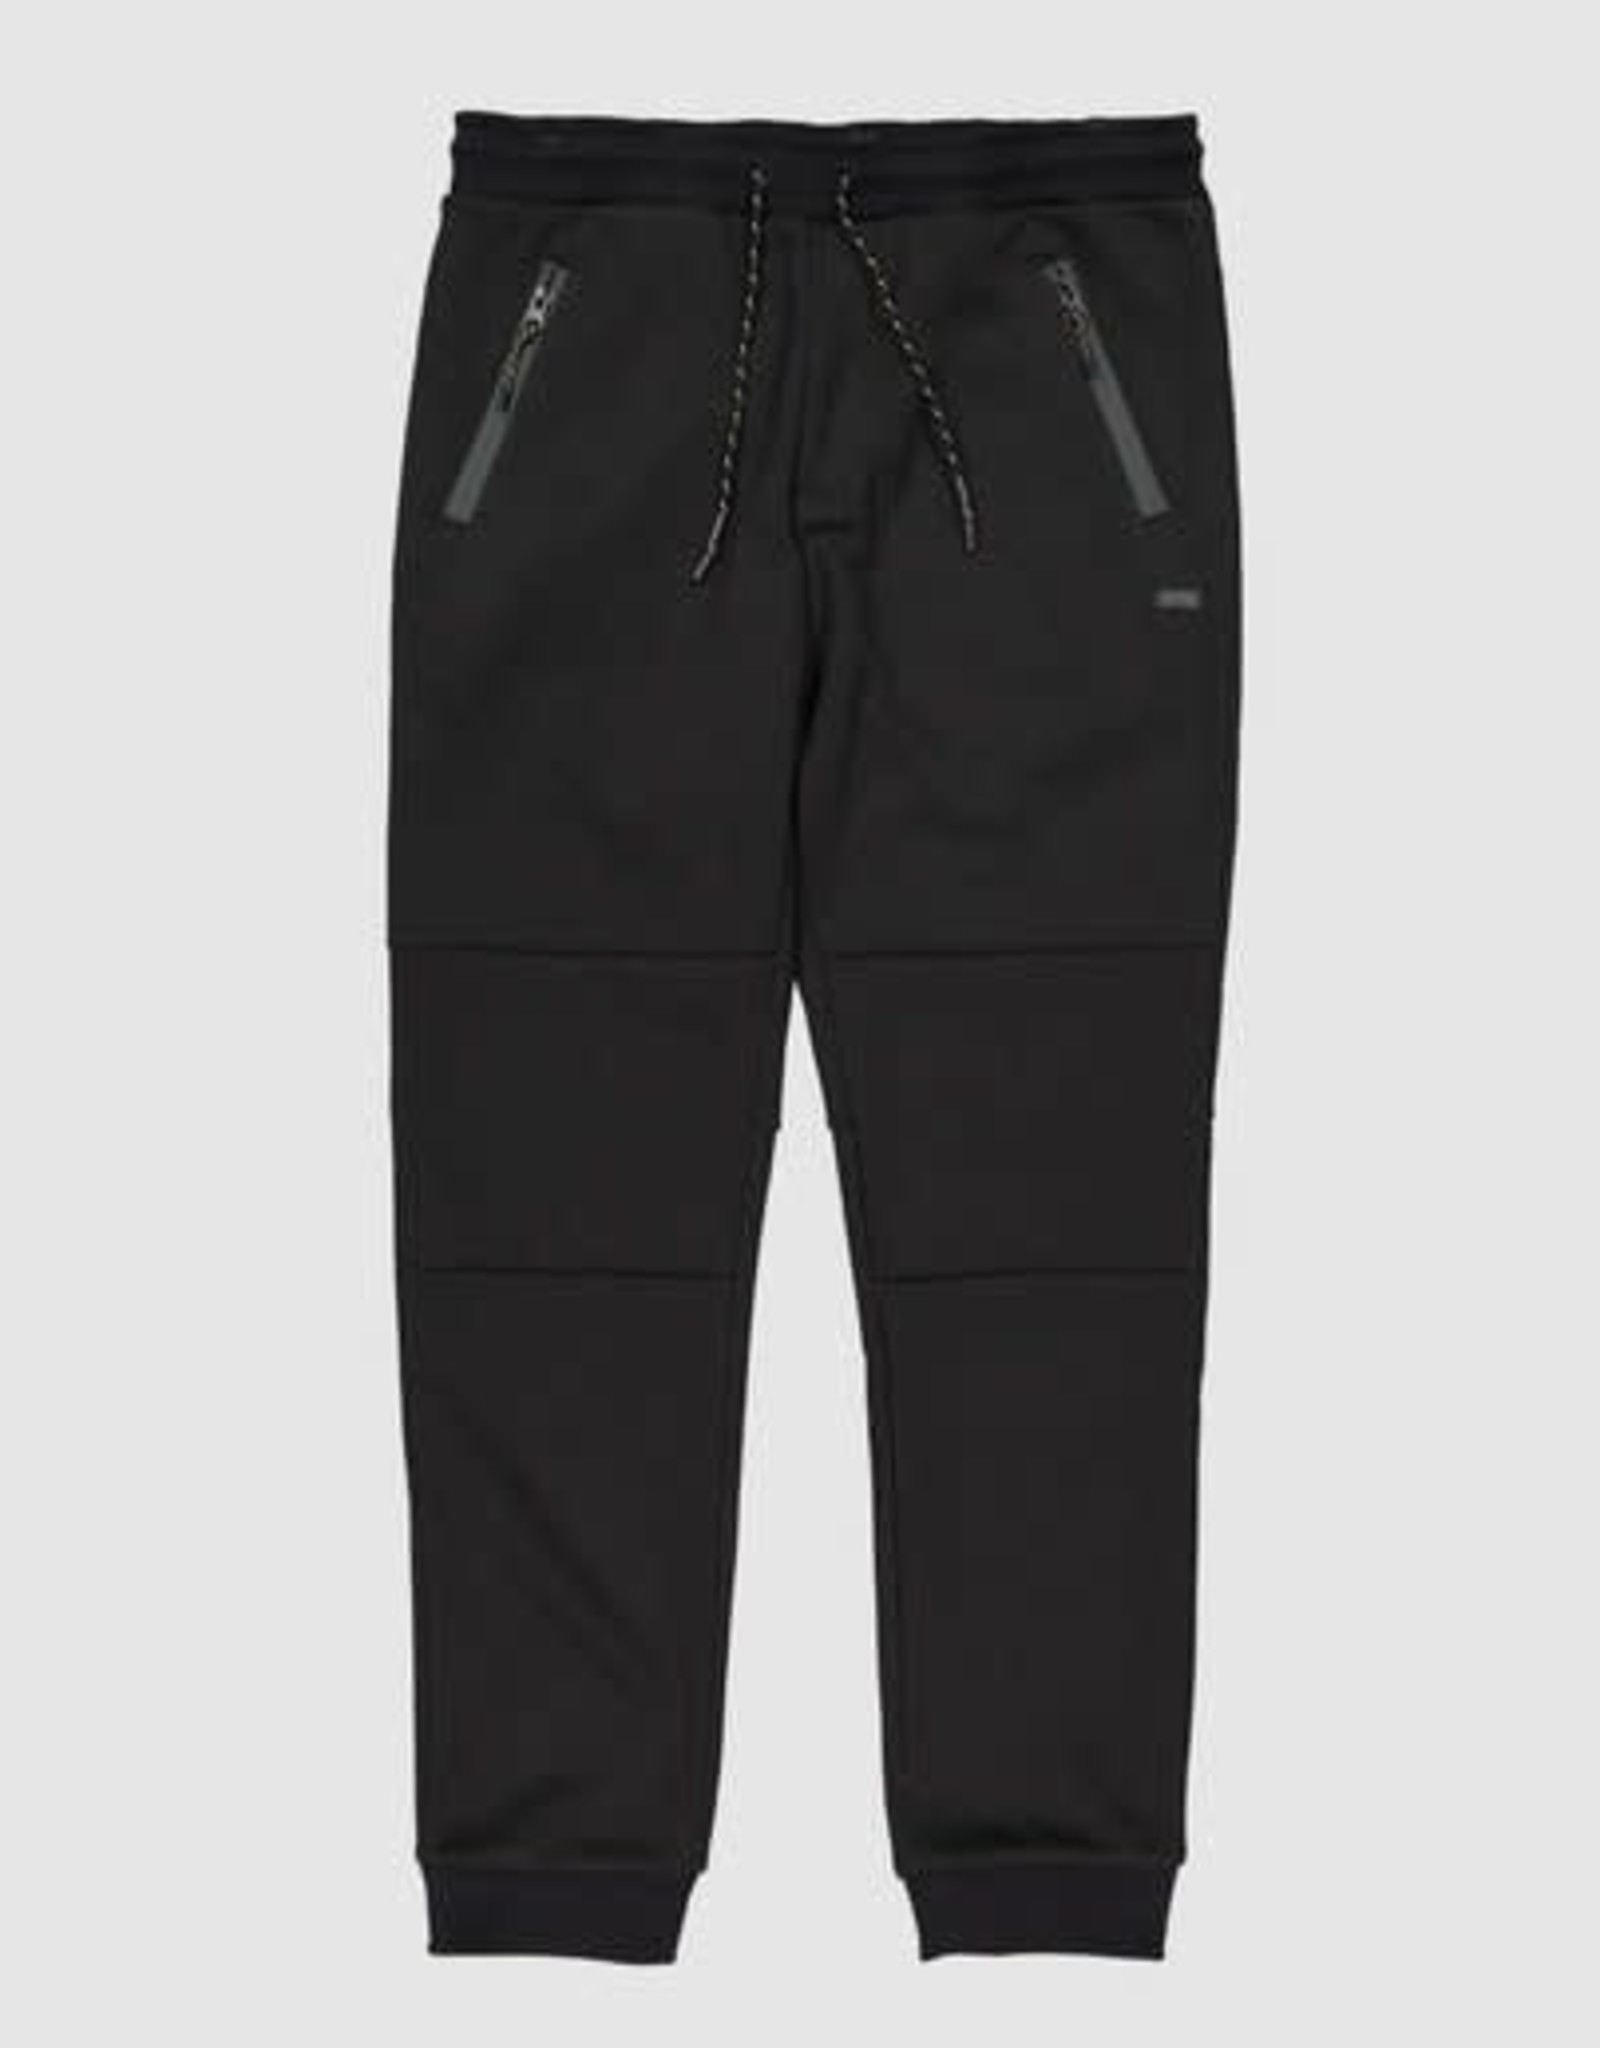 BILLABONG Adventure Division Tech Pants